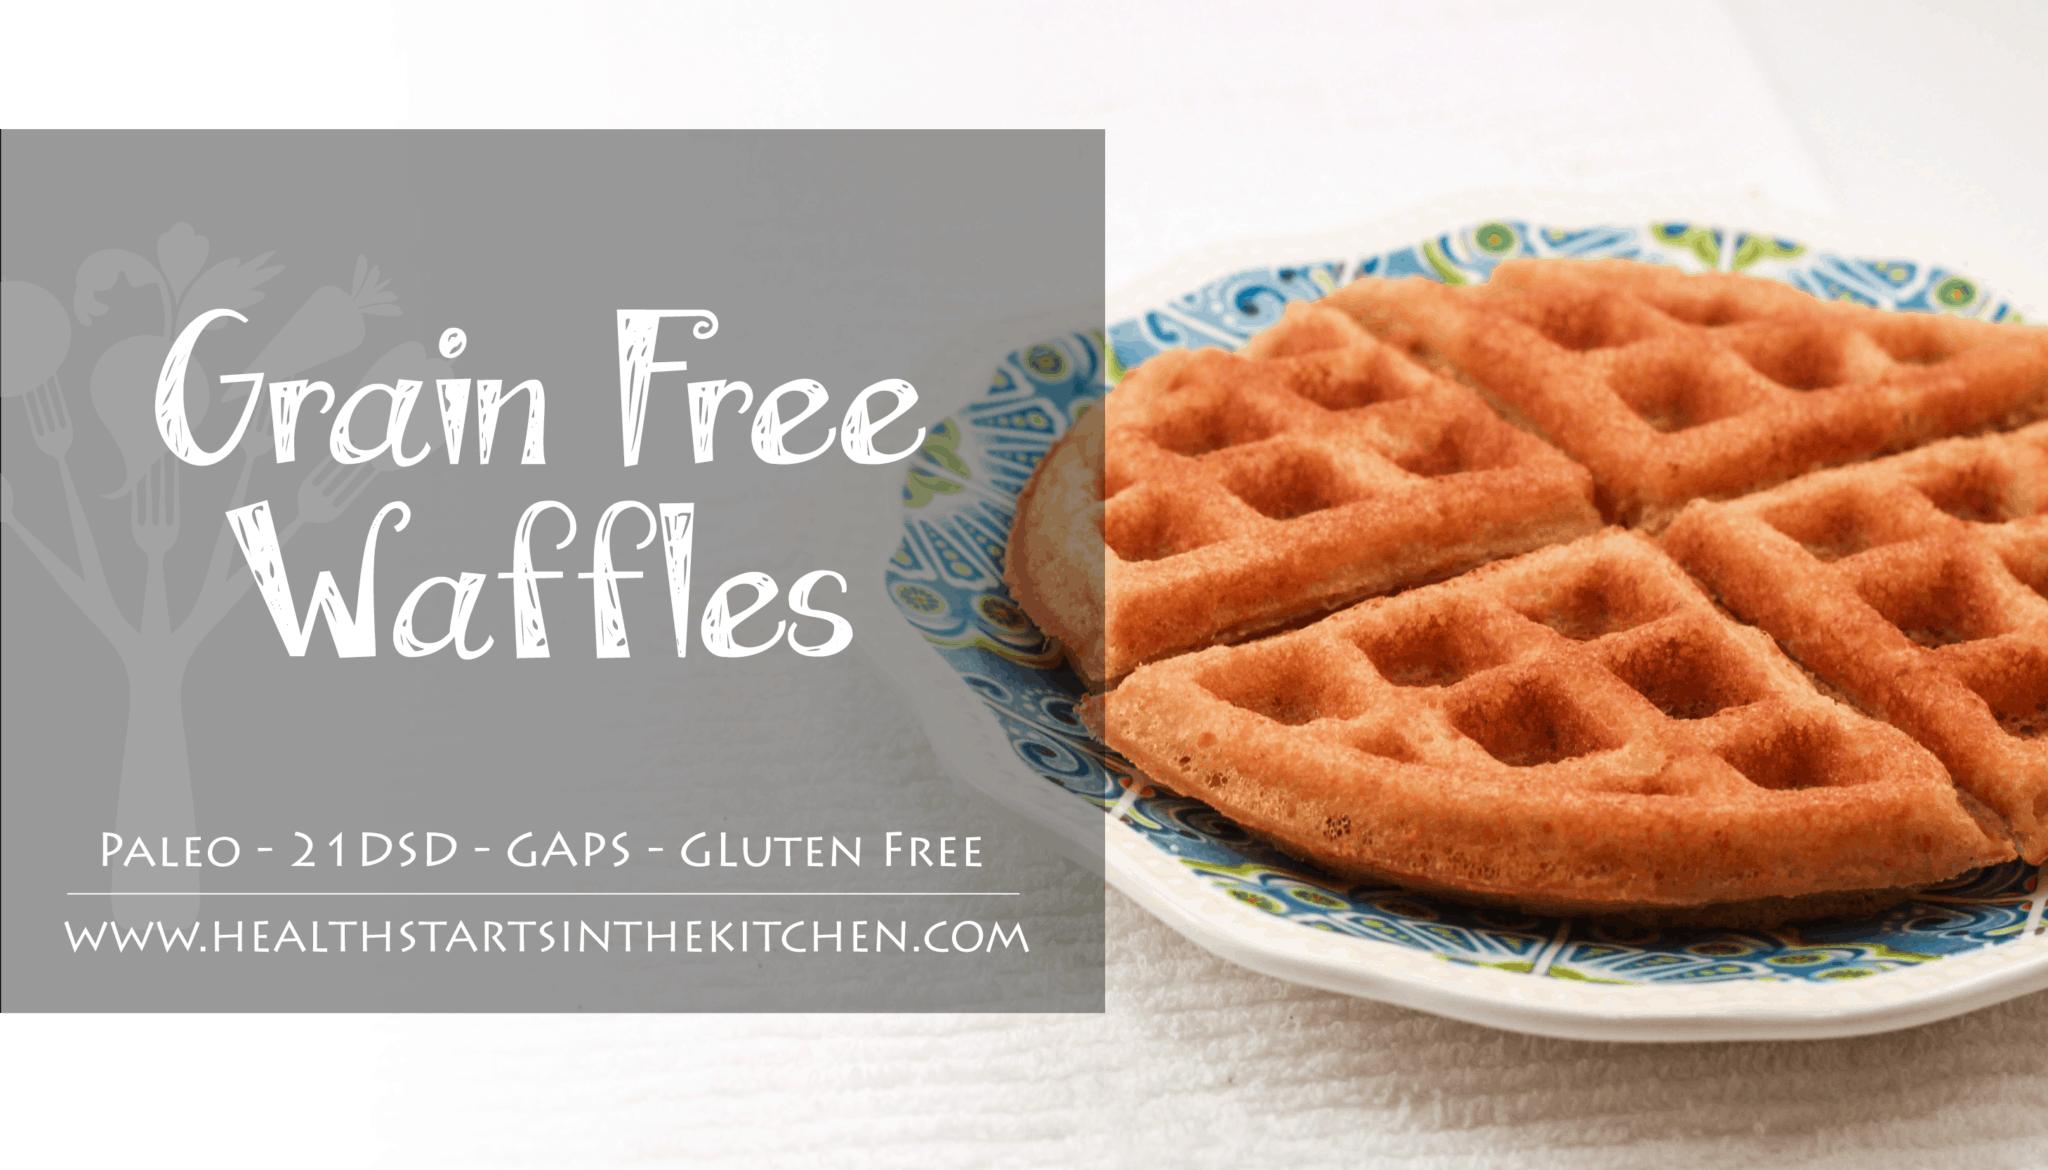 Crispy Grain Free Waffles